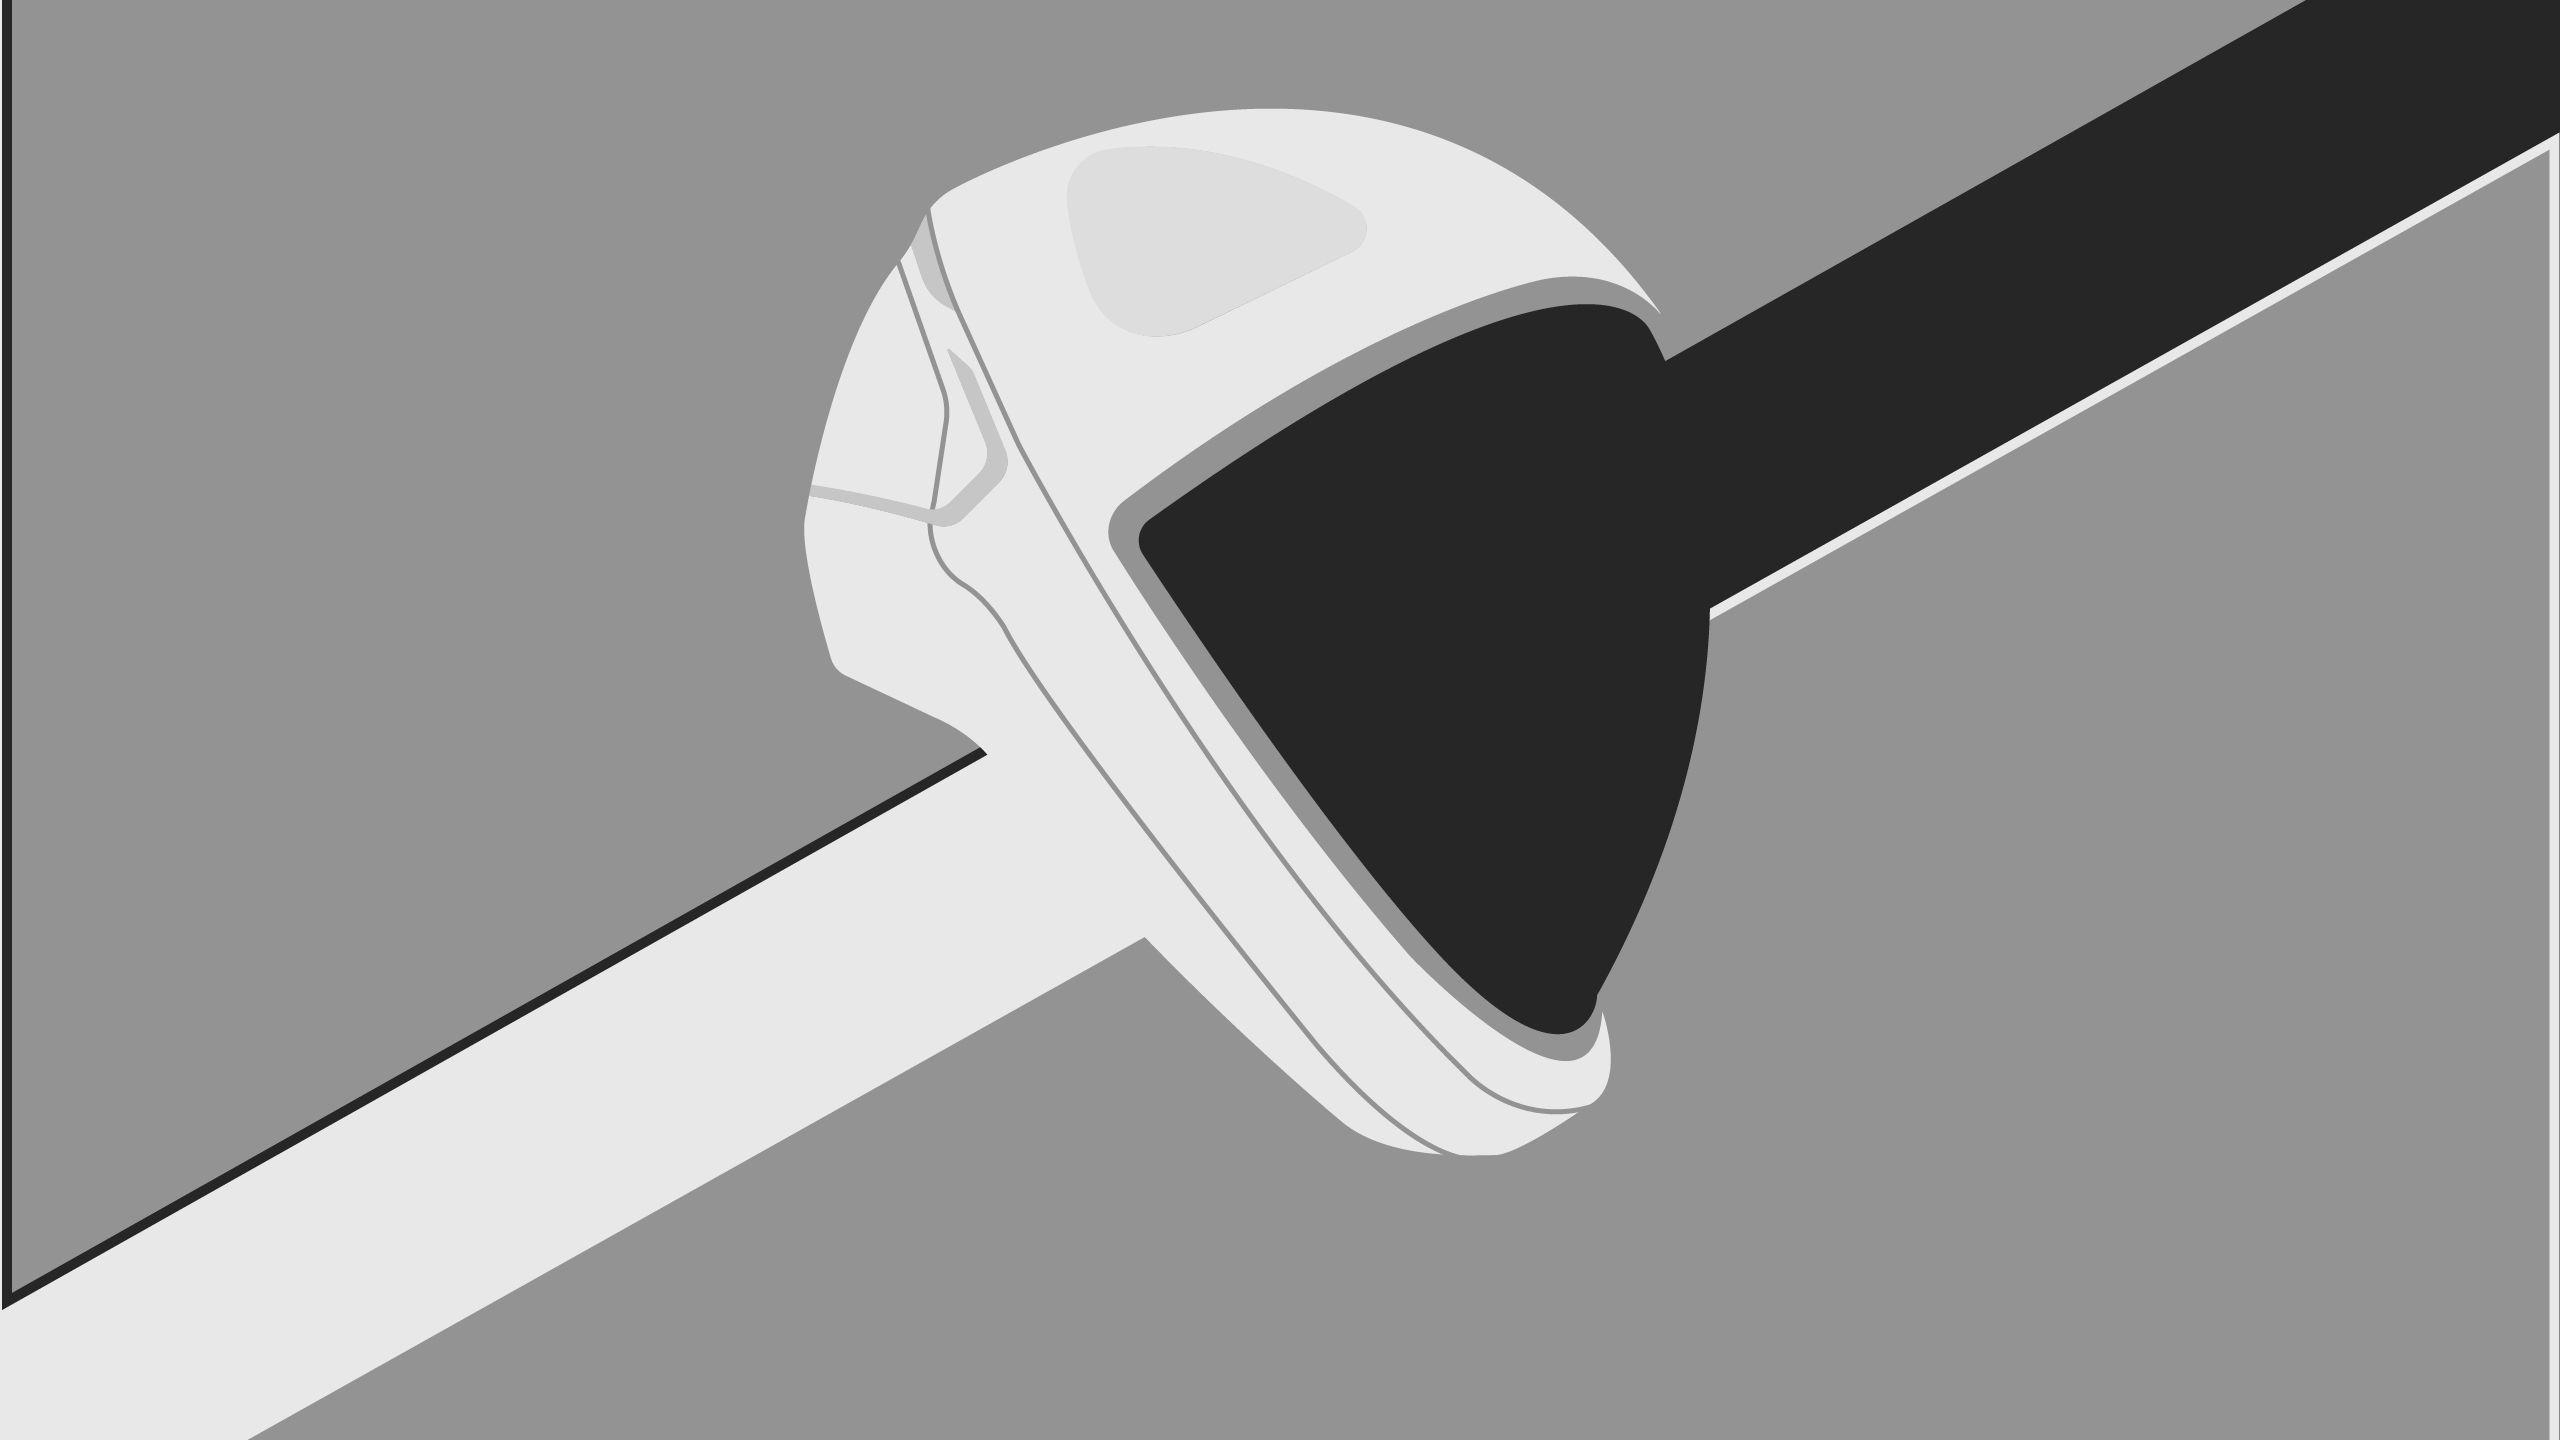 Spacex Helmet Wallpaper 2560 X 1440 Wallpapers